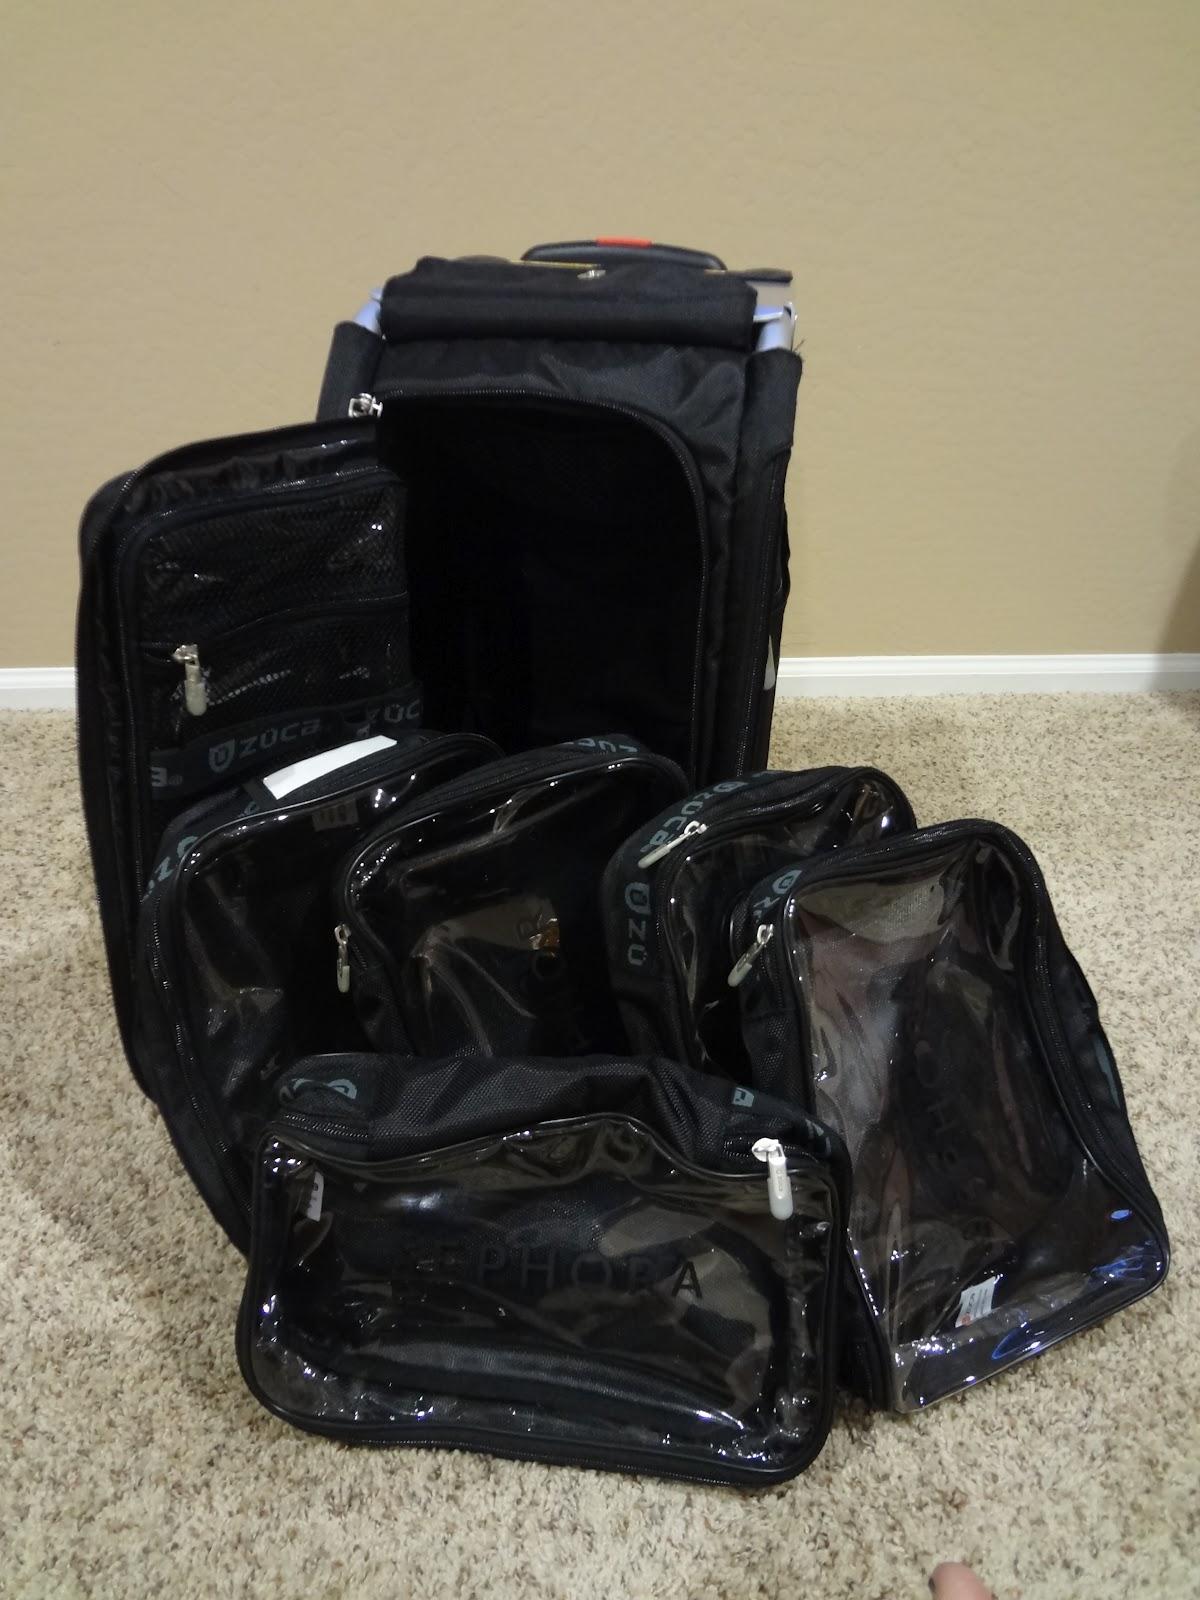 So Glam I Am New Zuca Bag Sephora Pro Rolling Bag